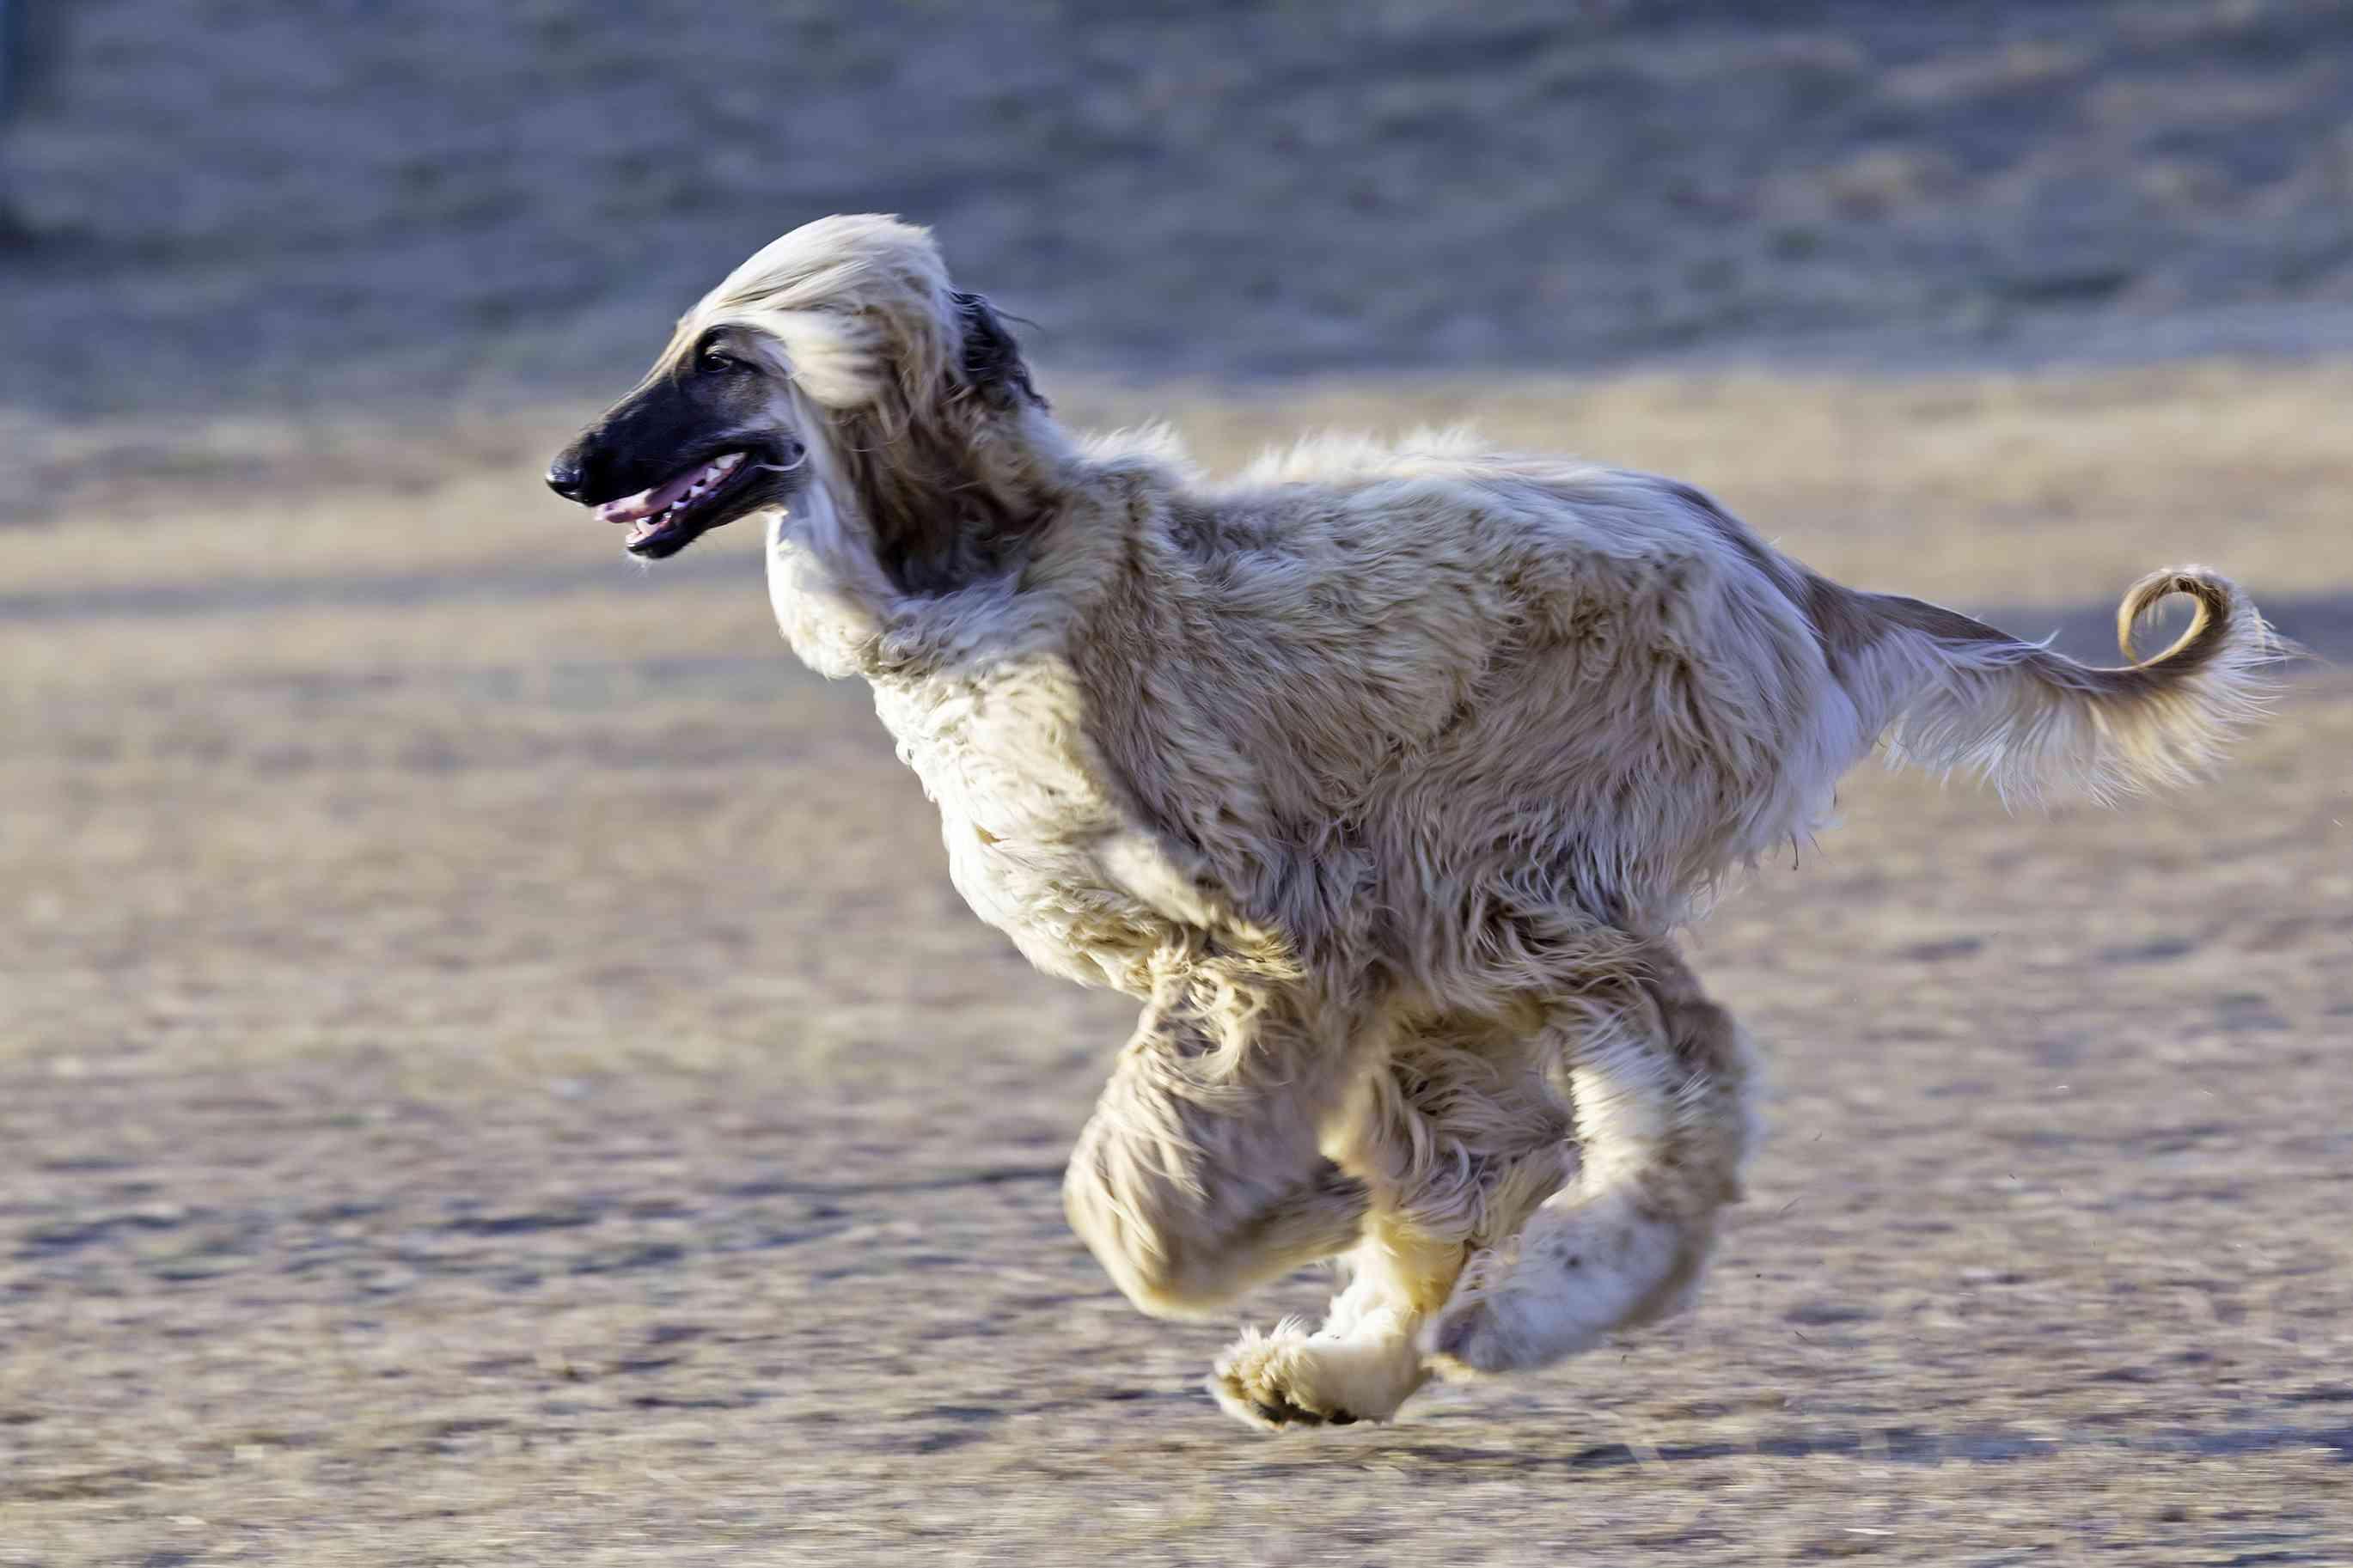 Afghan hound running across sand